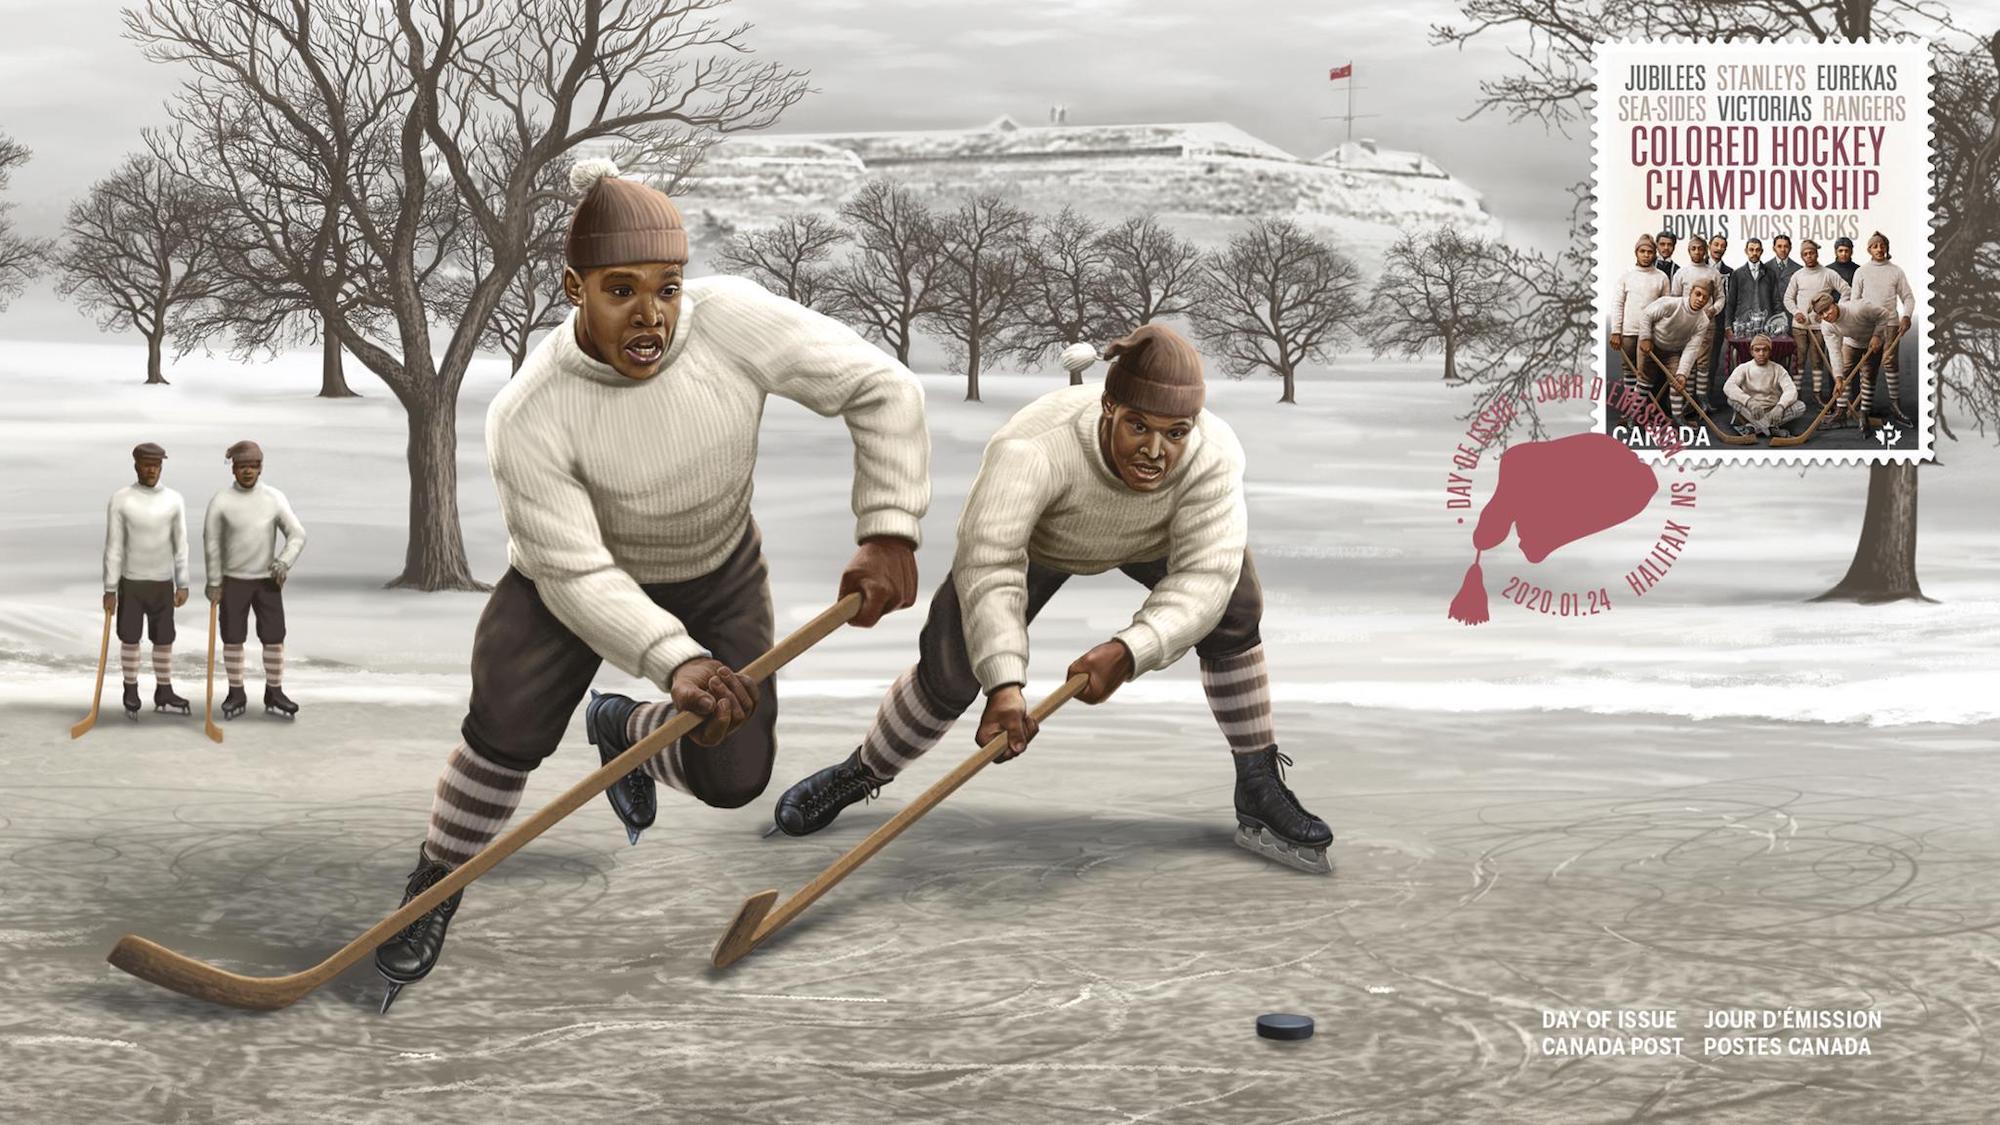 William Douglas, The Color of Hockey, Colored Hockey League, Jubilees, Stanleys, Eurekas, Sea-Sides, Rangers, Royals, Moss Backs, Racism, KOLUMN, KINDR'D Magazine, KINDR'D, Willoughby Avenue, Wriit,